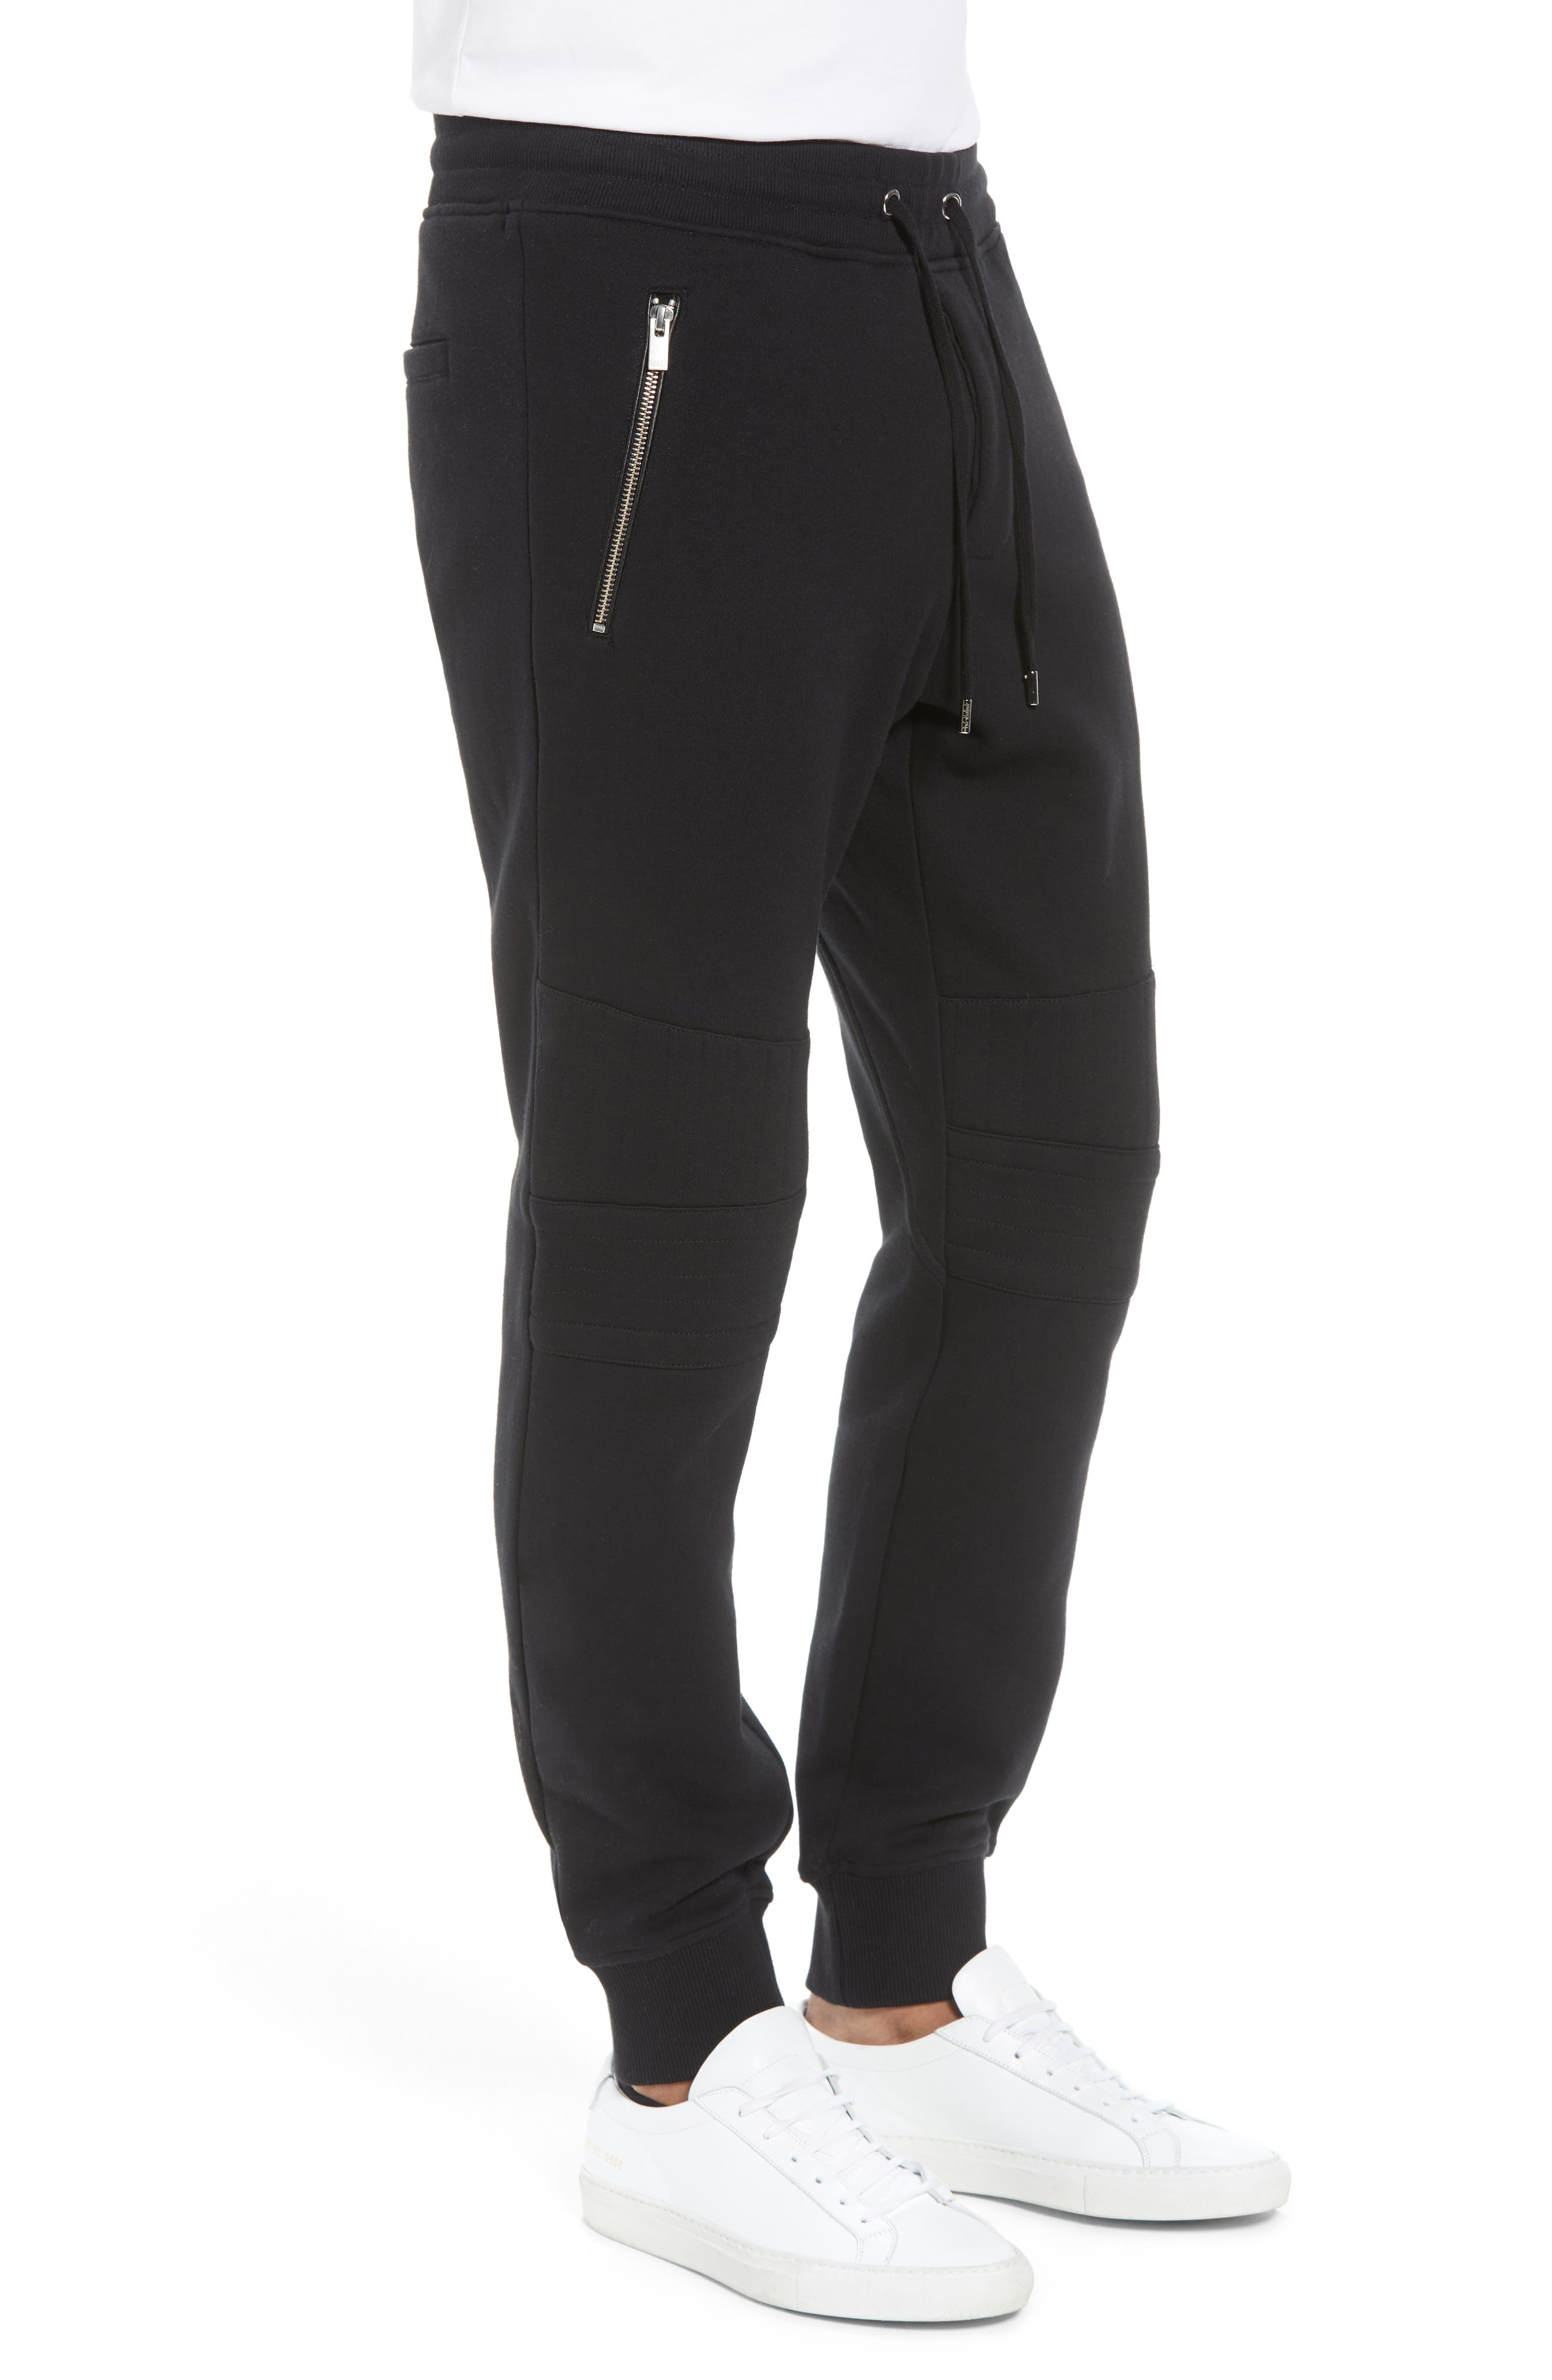 Classic Slim Fit Fleece Joggers,                             Alternate thumbnail 3, color,                             BLACK BLA01